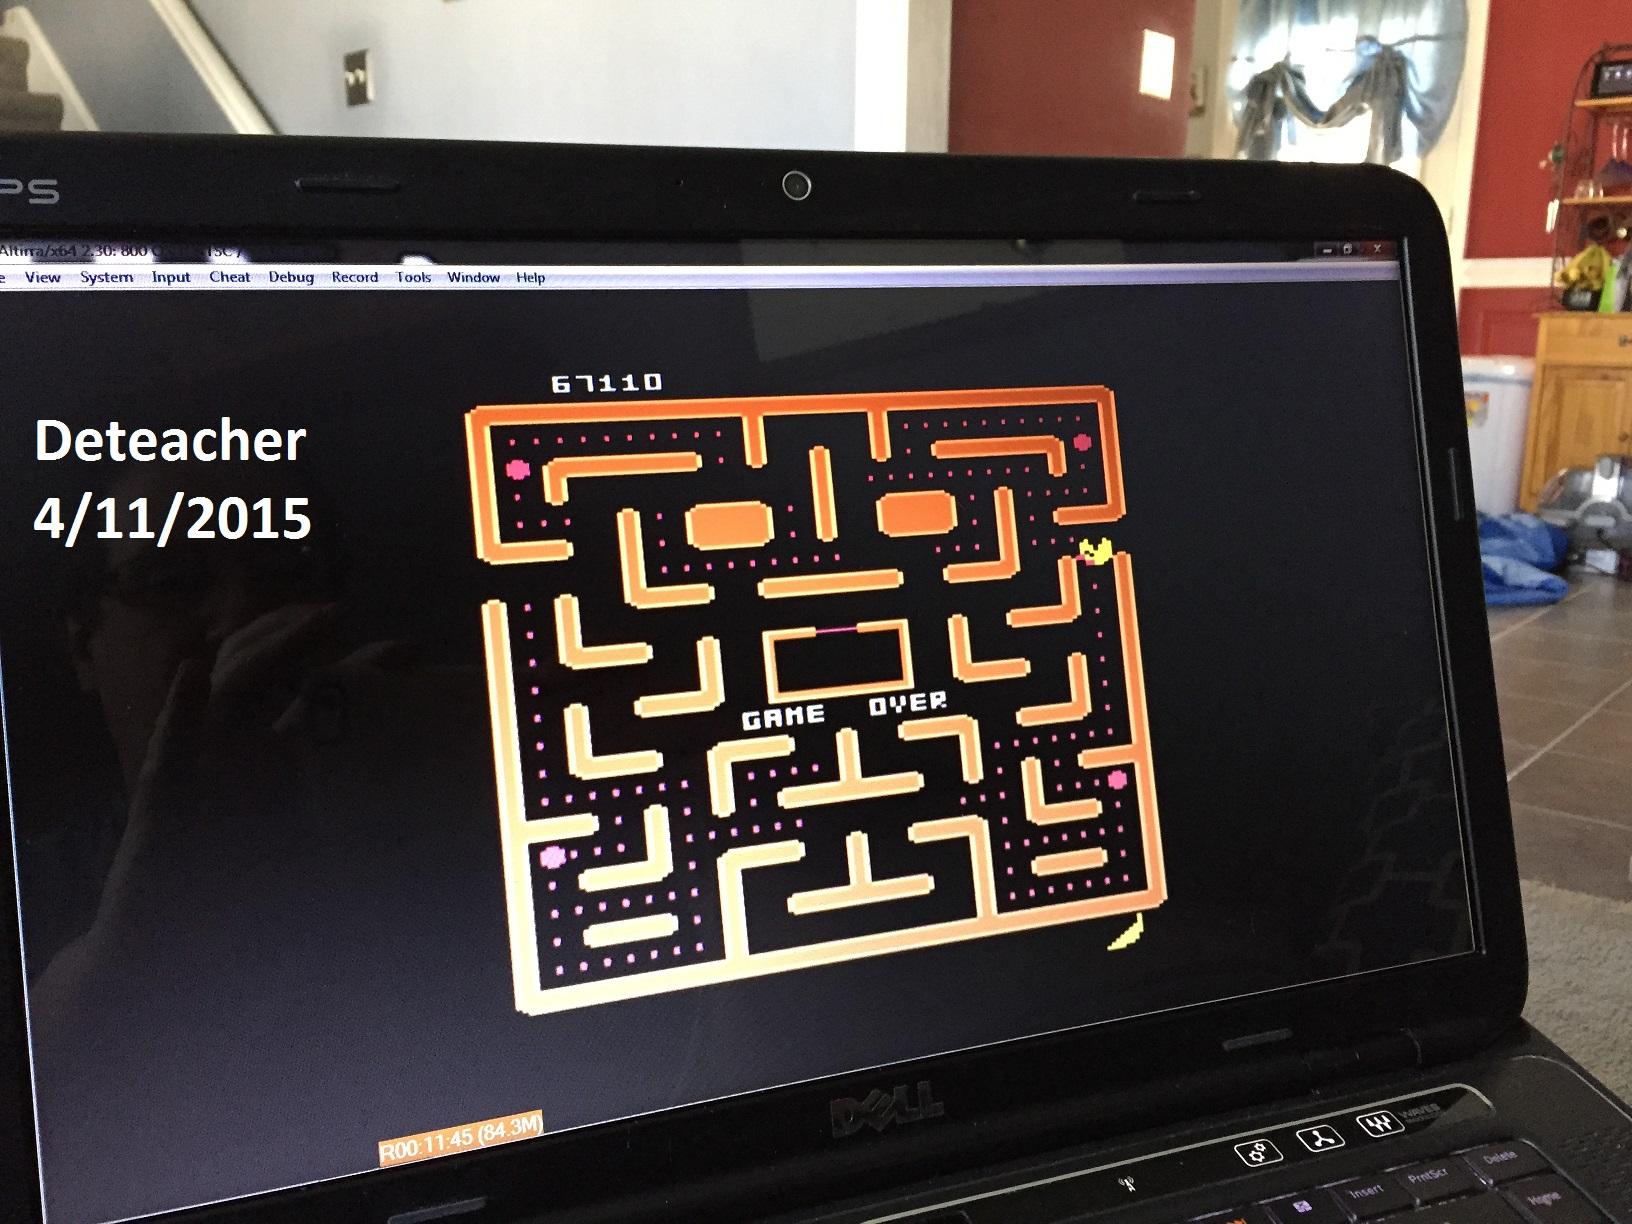 Deteacher: Ms. Pac-Man (Atari 400/800/XL/XE Emulated) 67,110 points on 2015-04-11 15:47:51